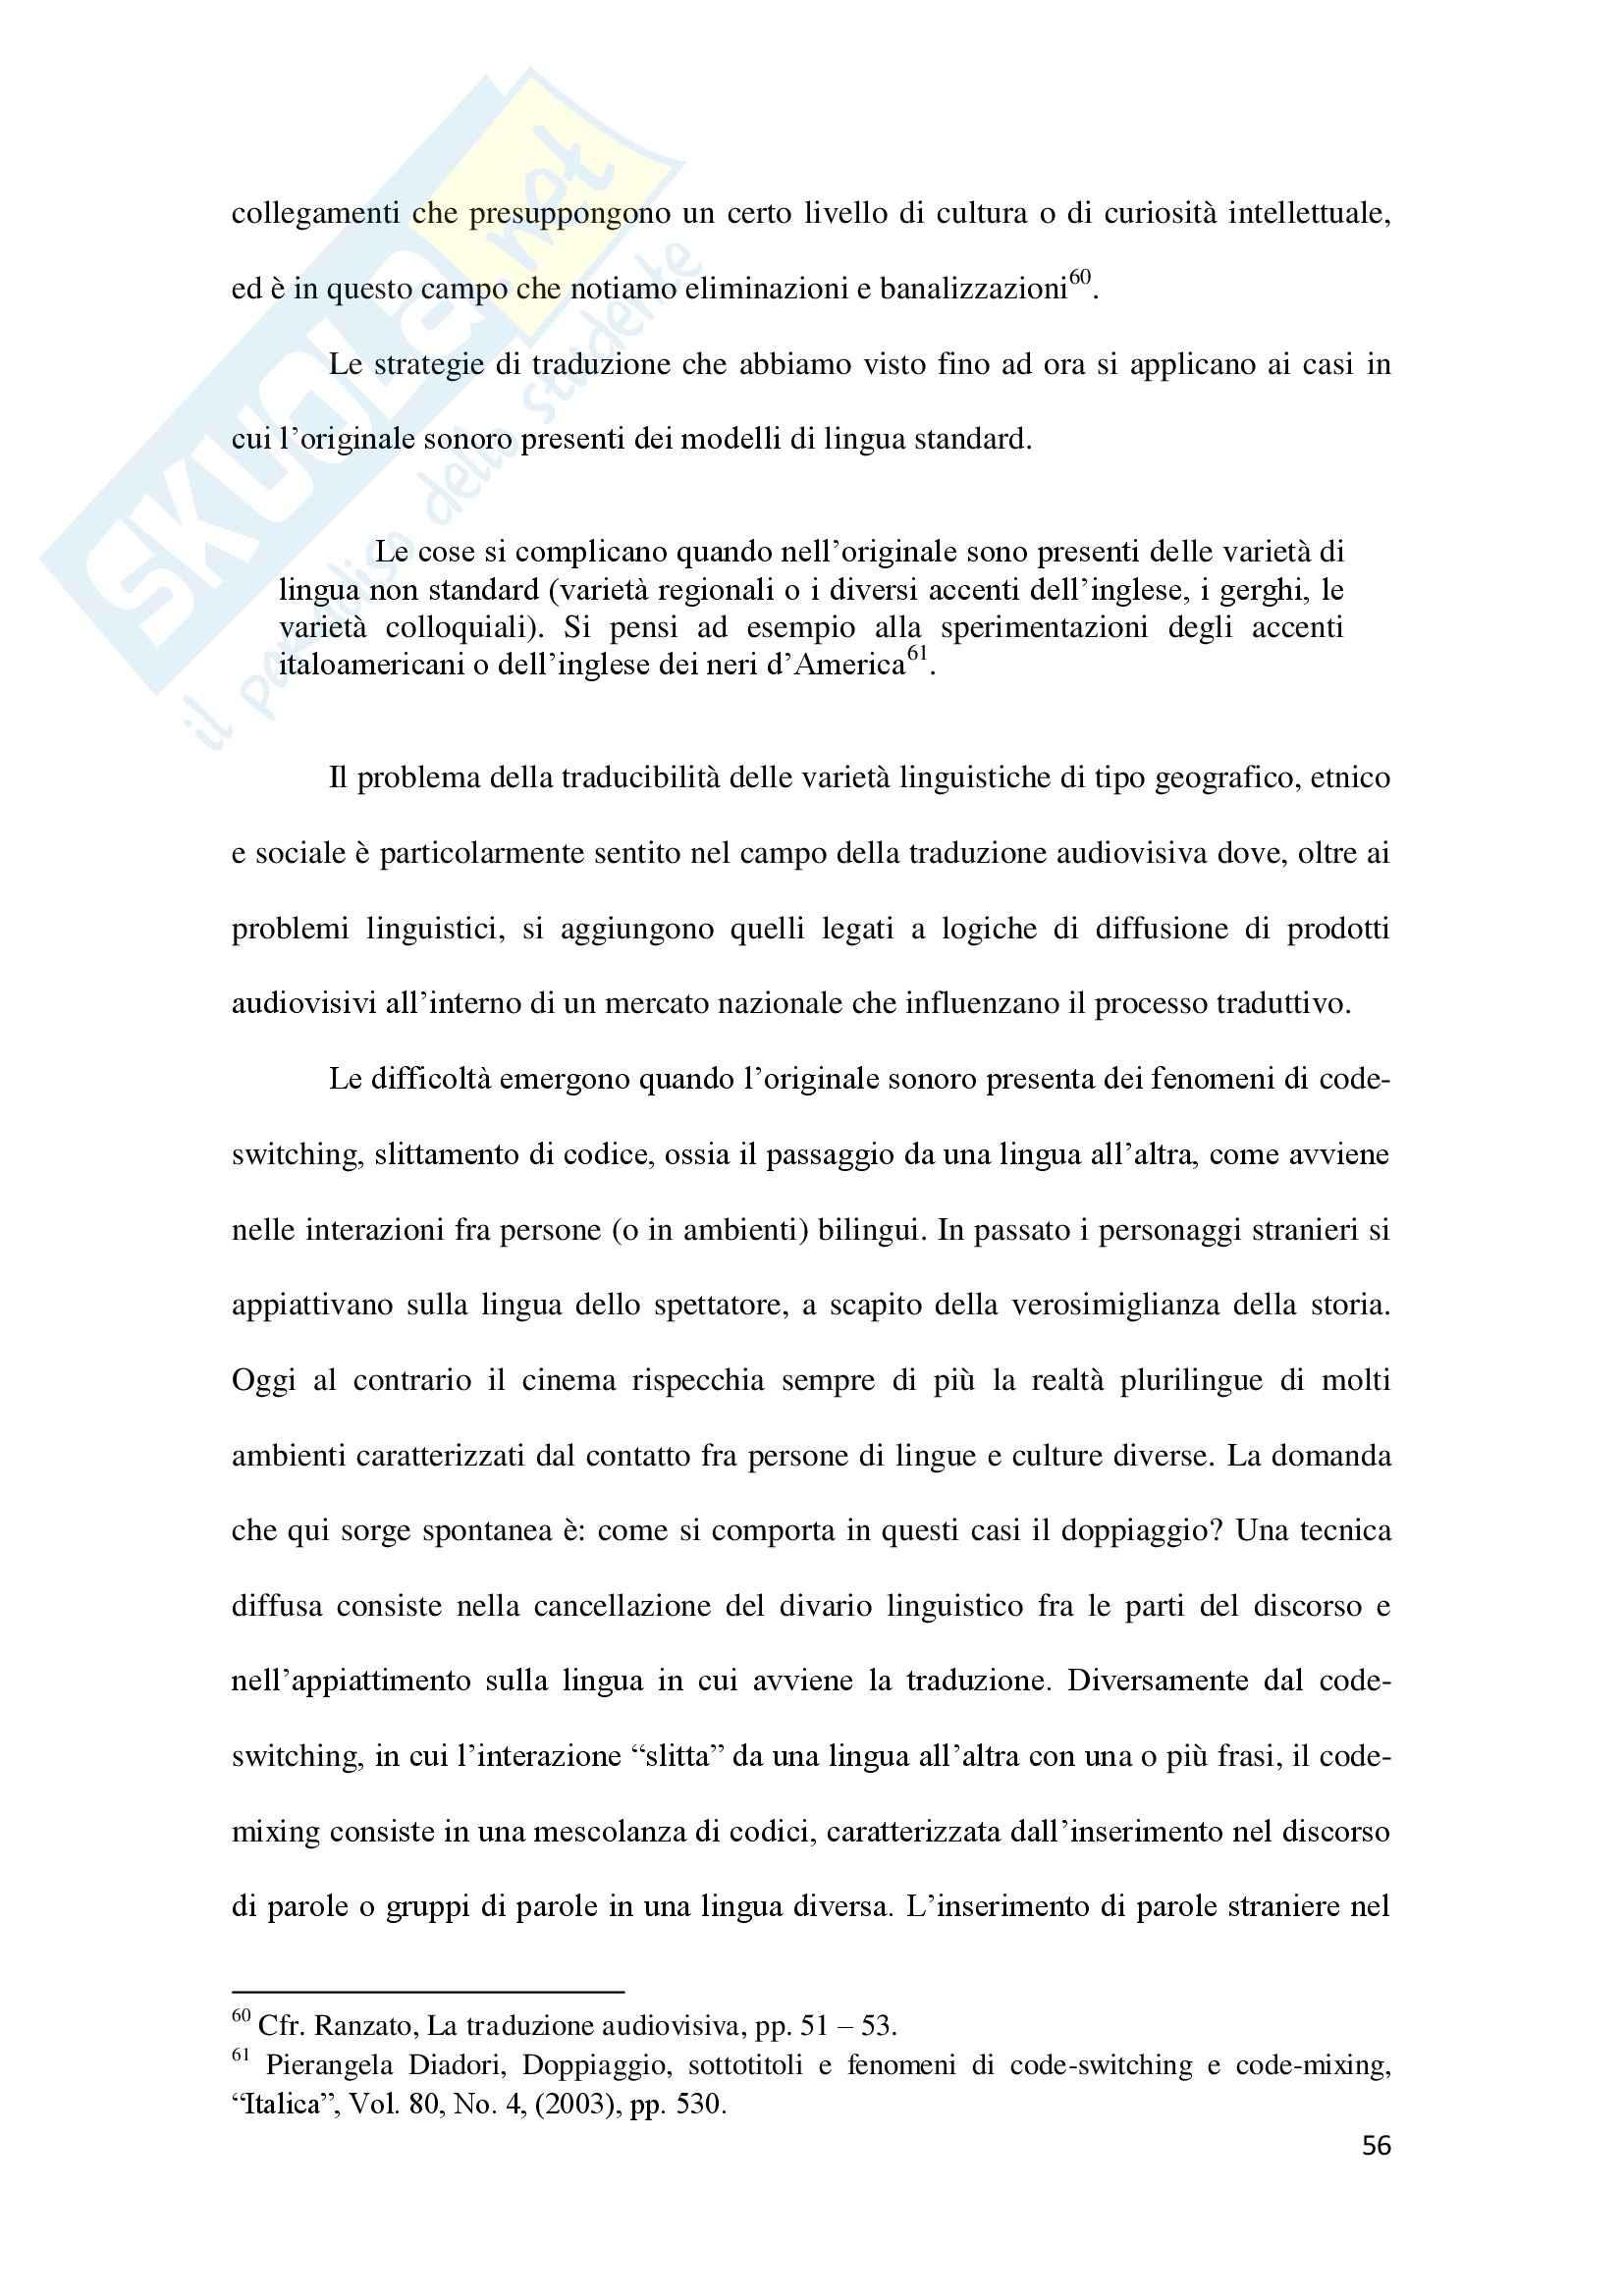 Linguaggio di Internet, Lingua inglese Pag. 56